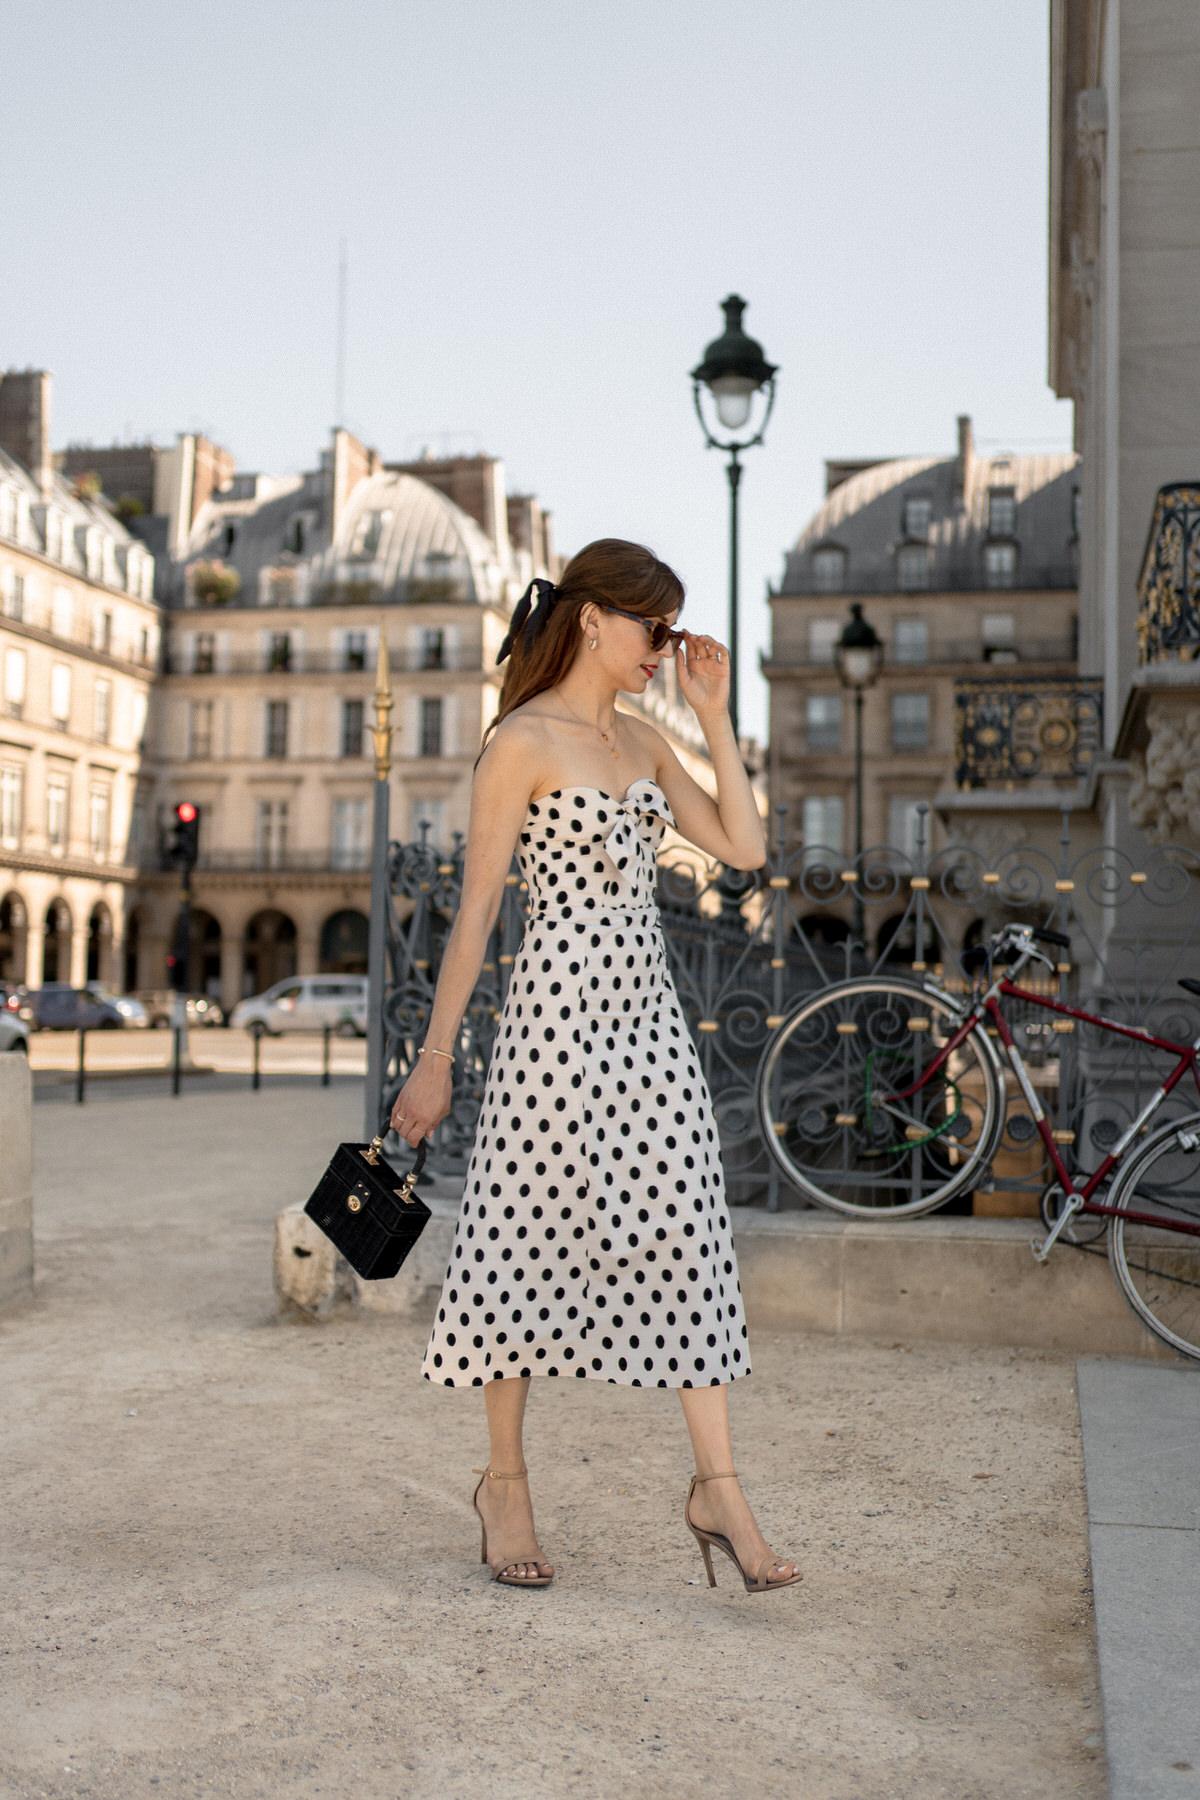 comment-porter-robe-bustier-sezane-beatriz-6-1